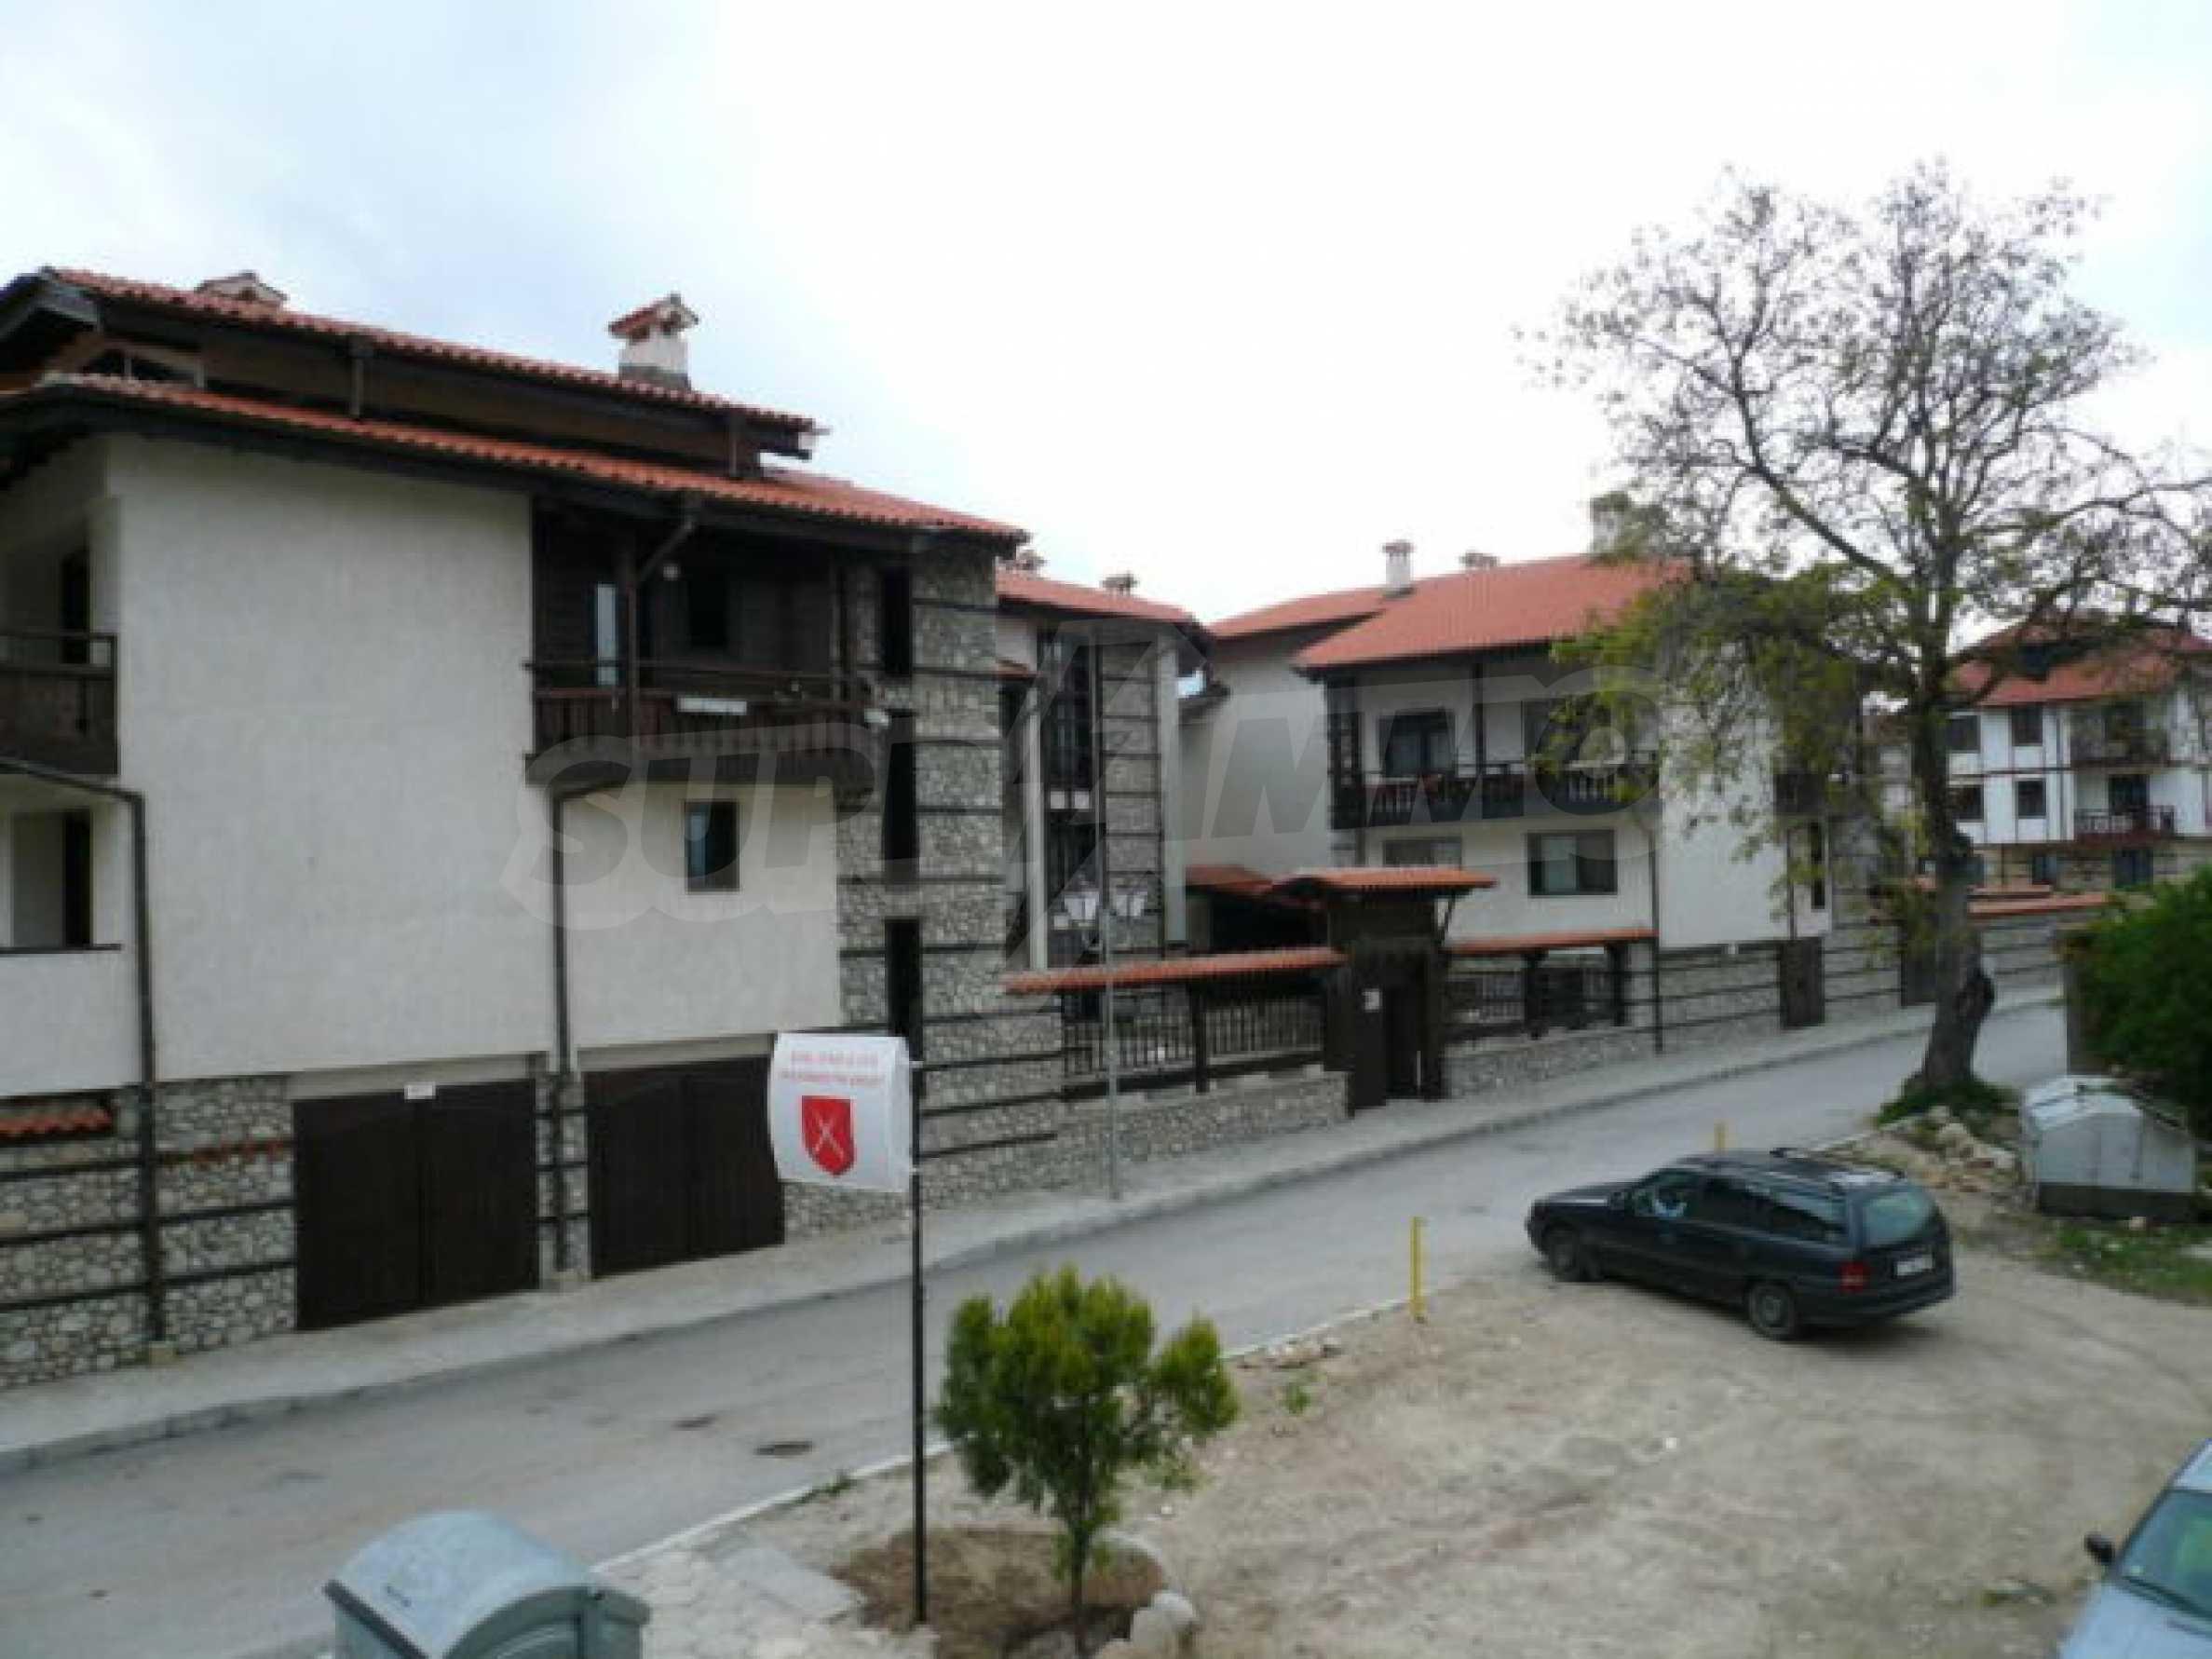 Двустаен апартамент за продажба в гр. Банско 12